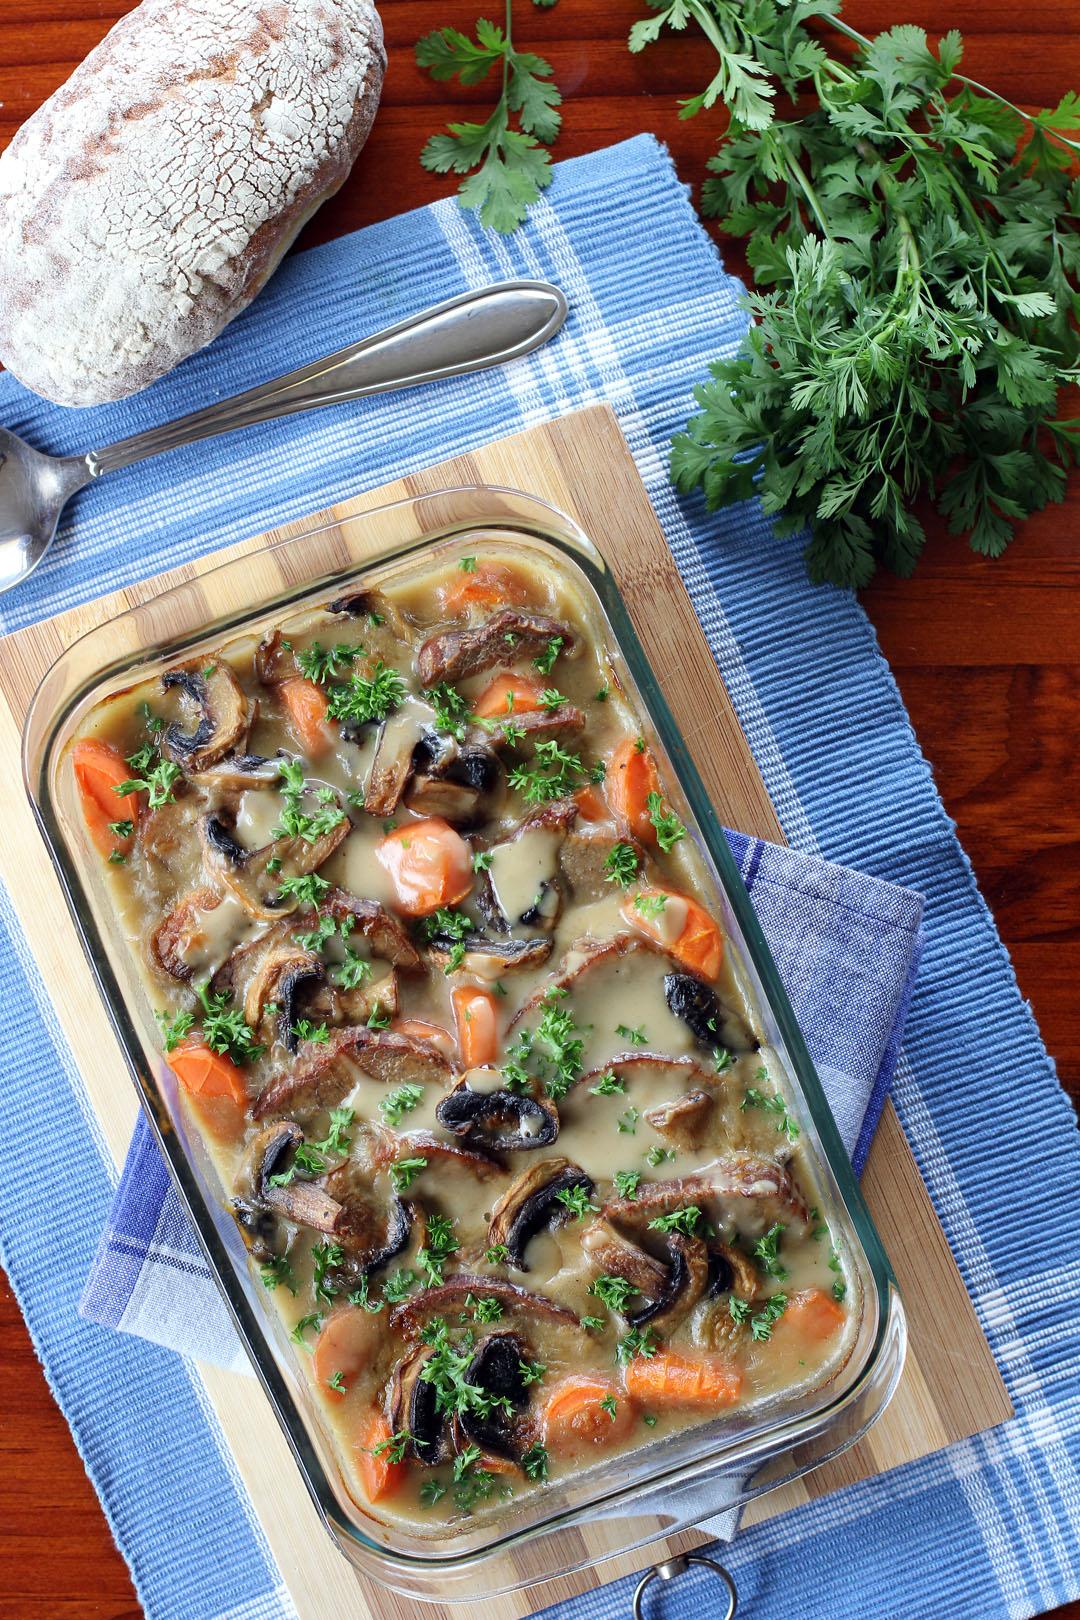 Filipino Style Pot Roast In Creamy Mushroom Gravy